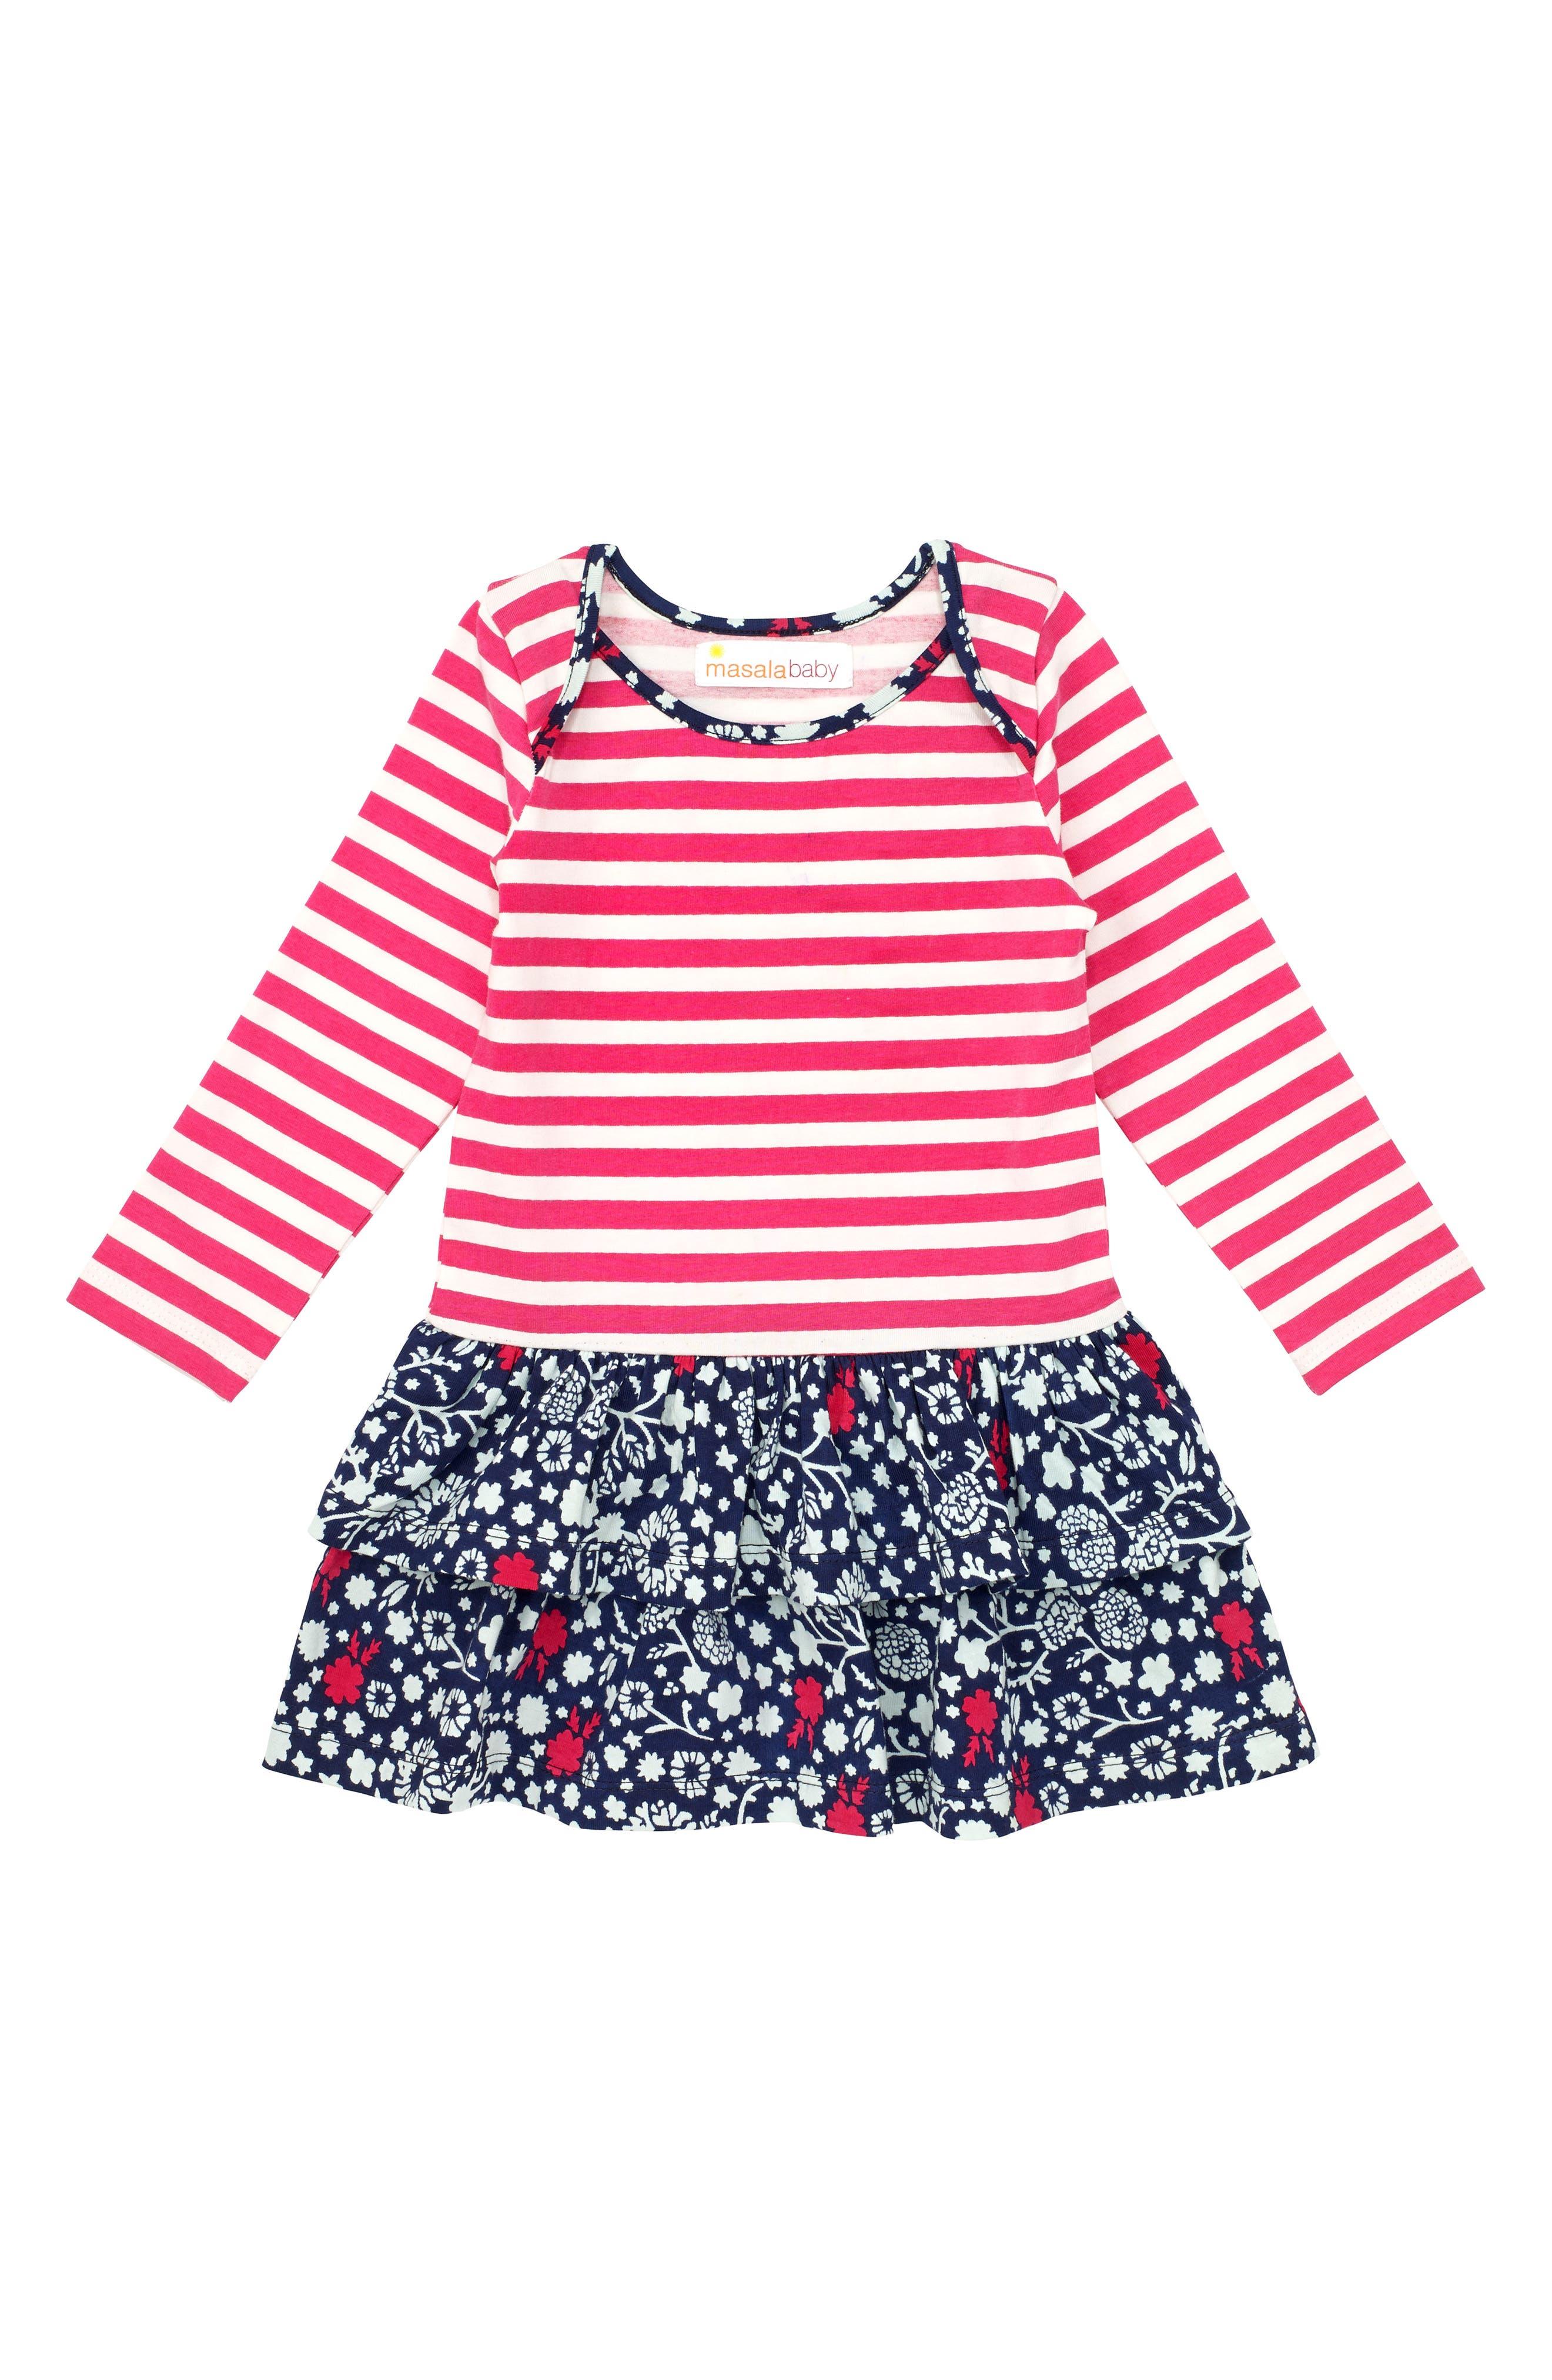 Masalababy Belle Organic Cotton Dress (Baby Girls)